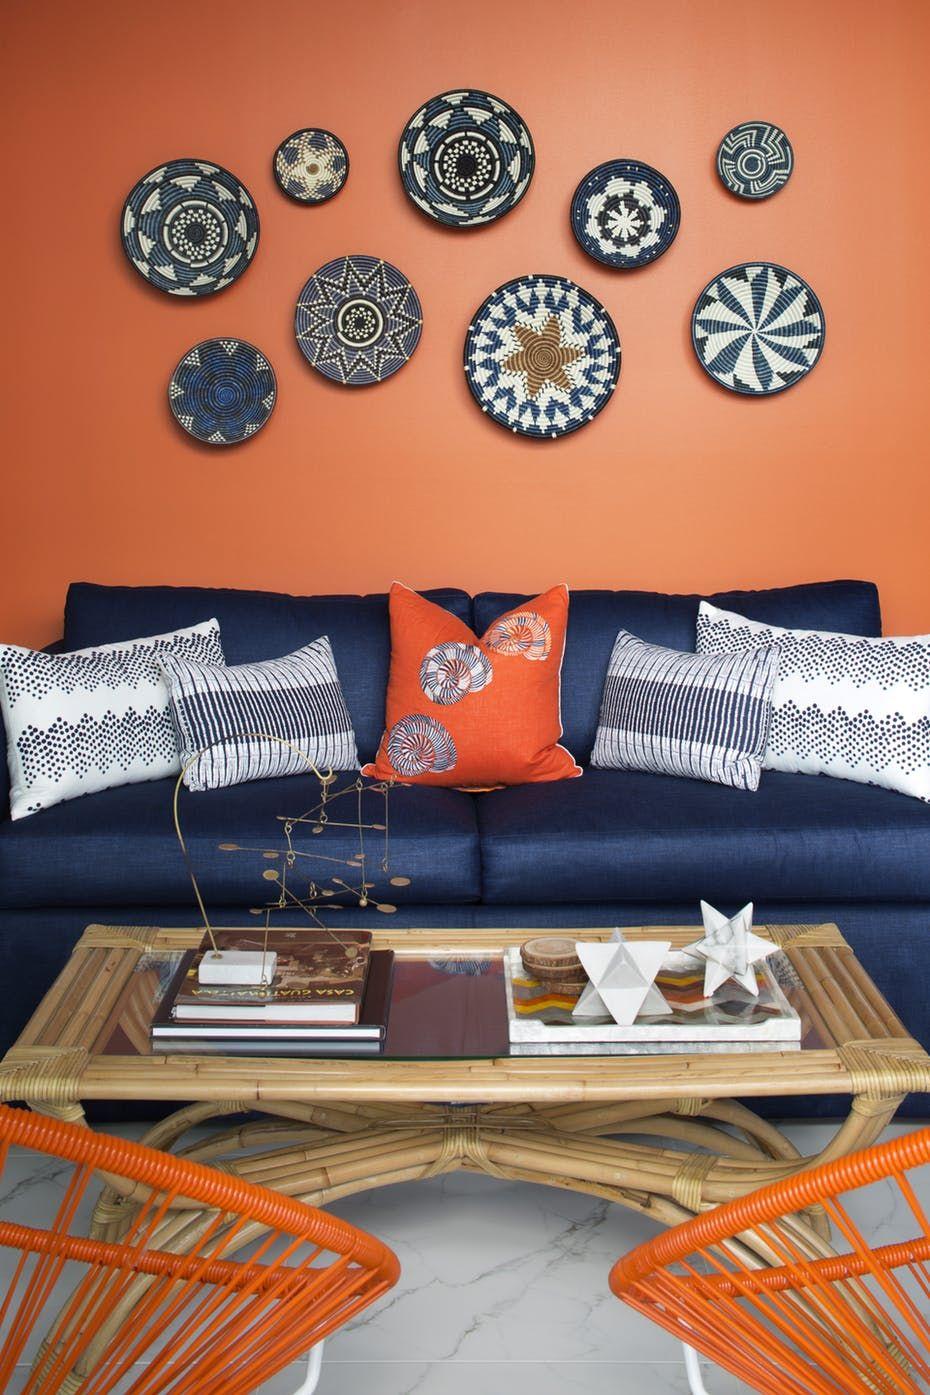 Oceanside Retreat Vacation Residence By Lisa Michael Interiors   Lookbook    Dering Hall